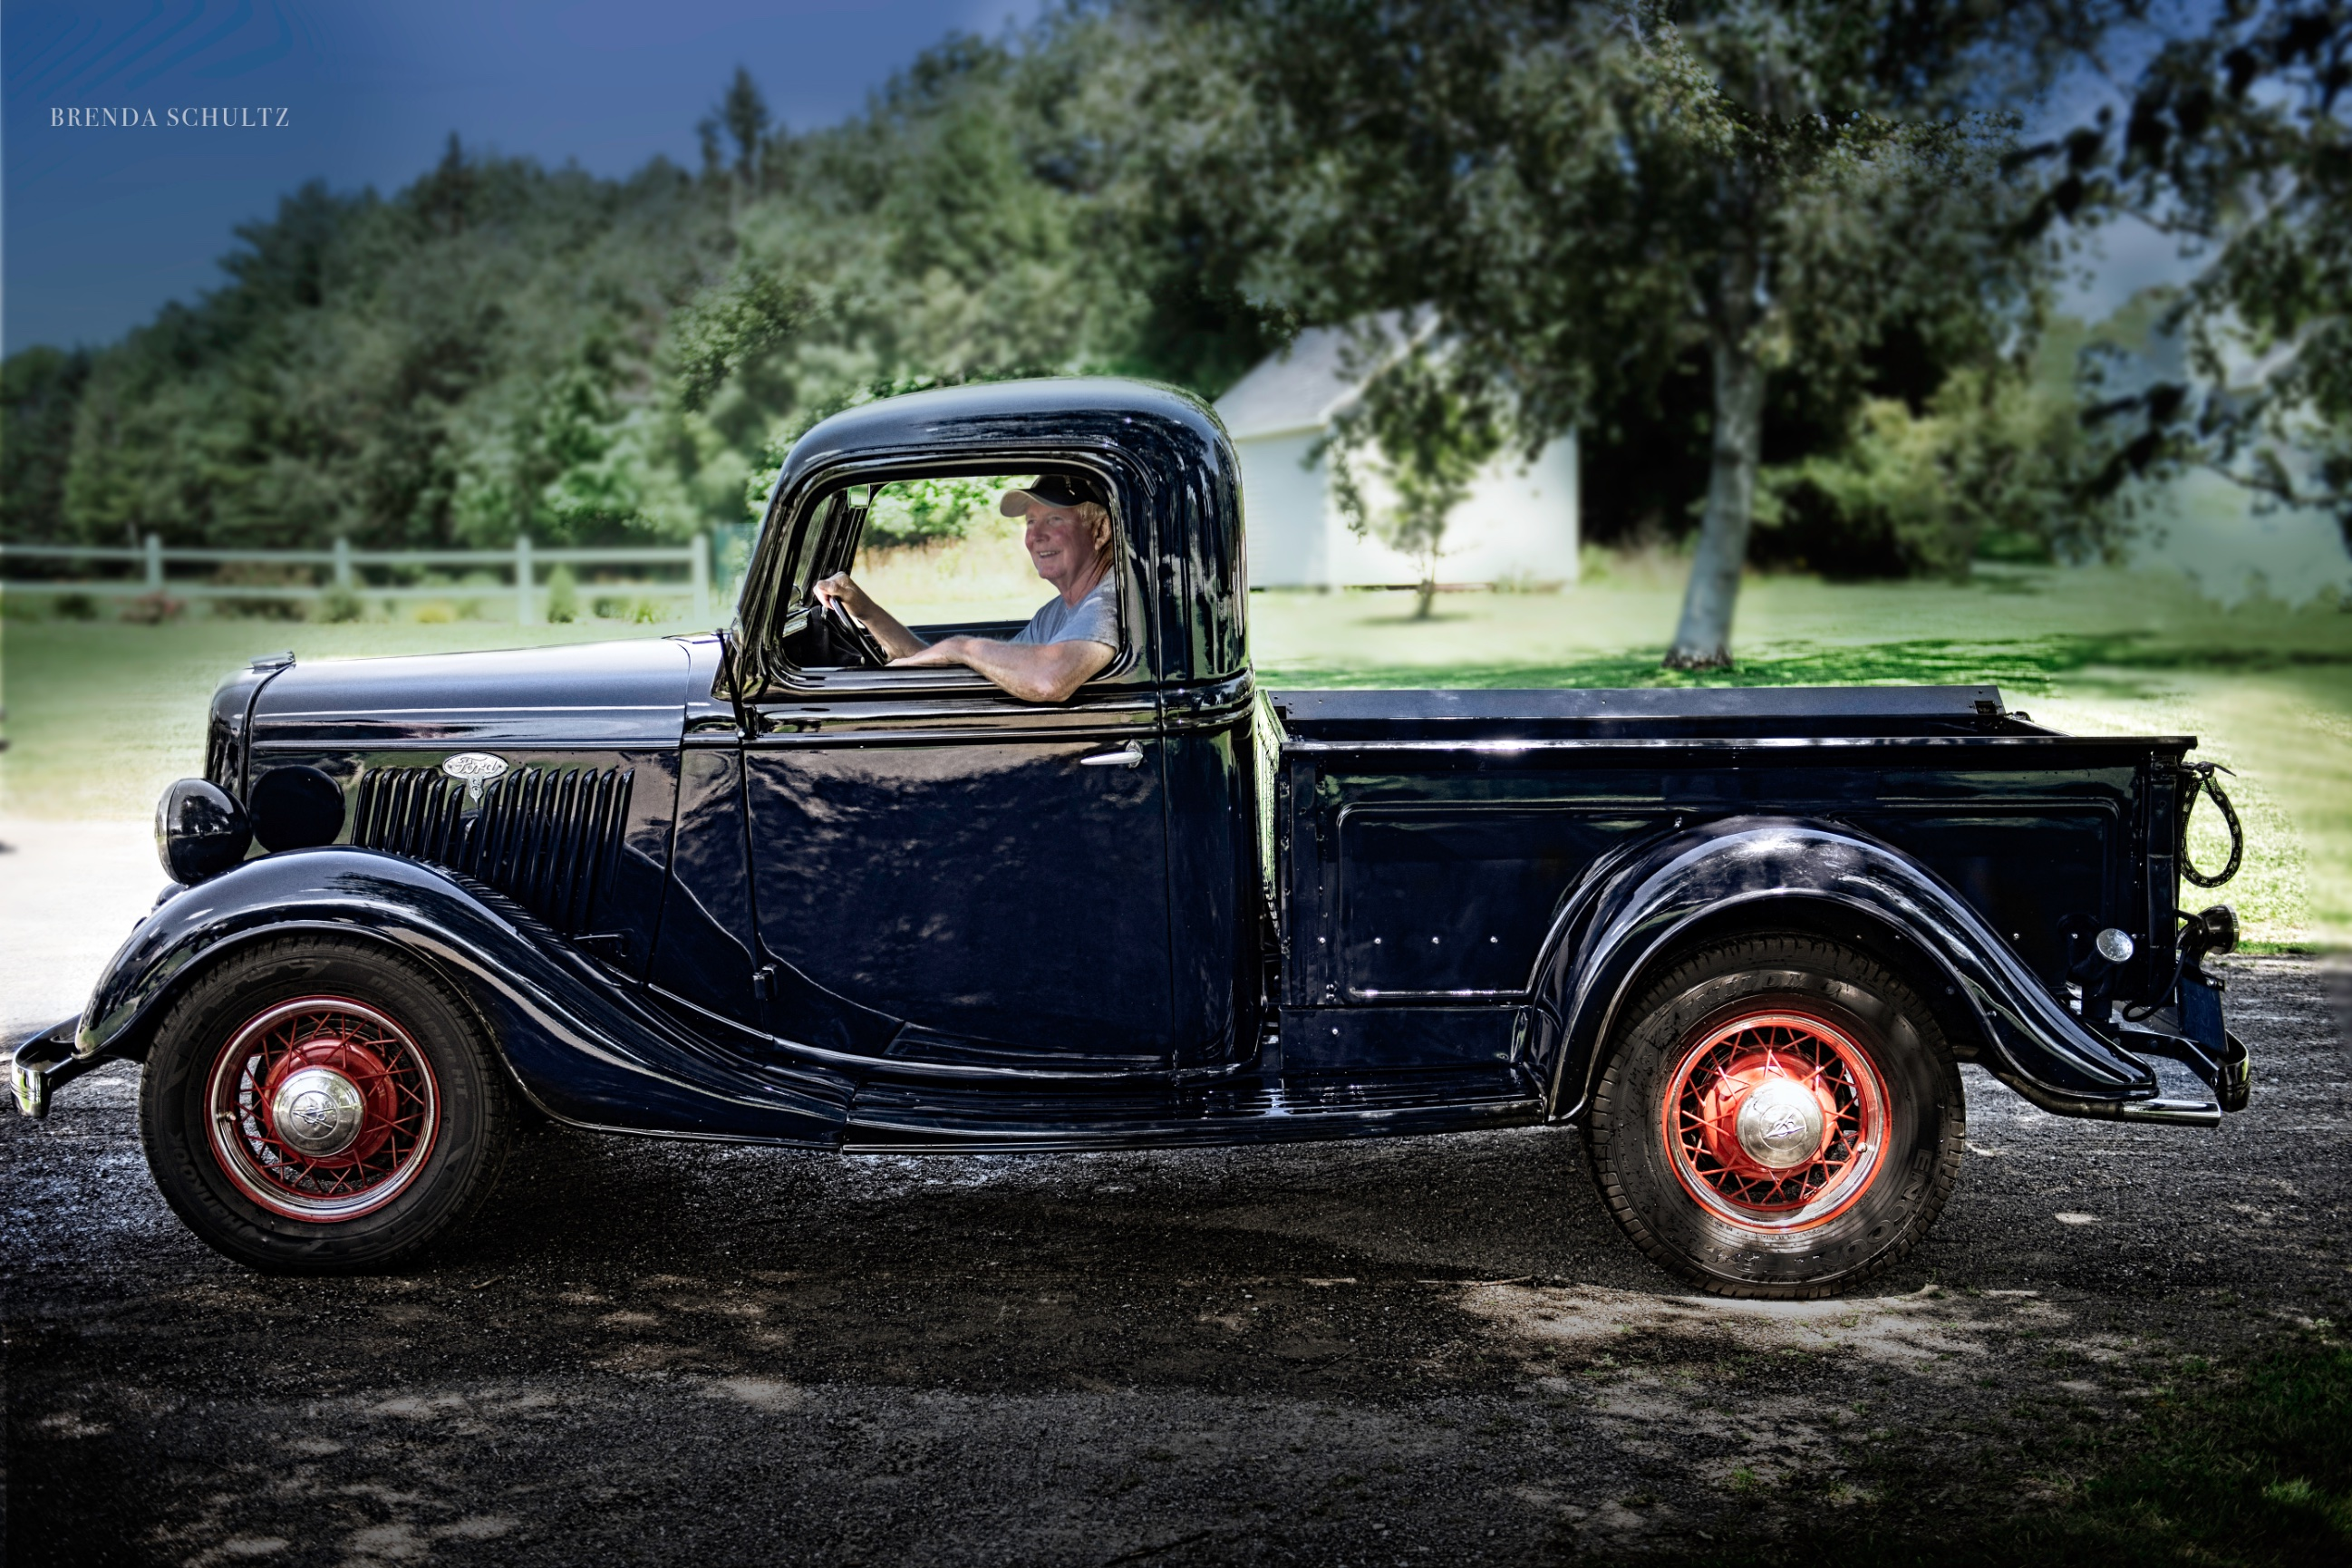 Vintage Car Photography - Brenda Schultz Photography